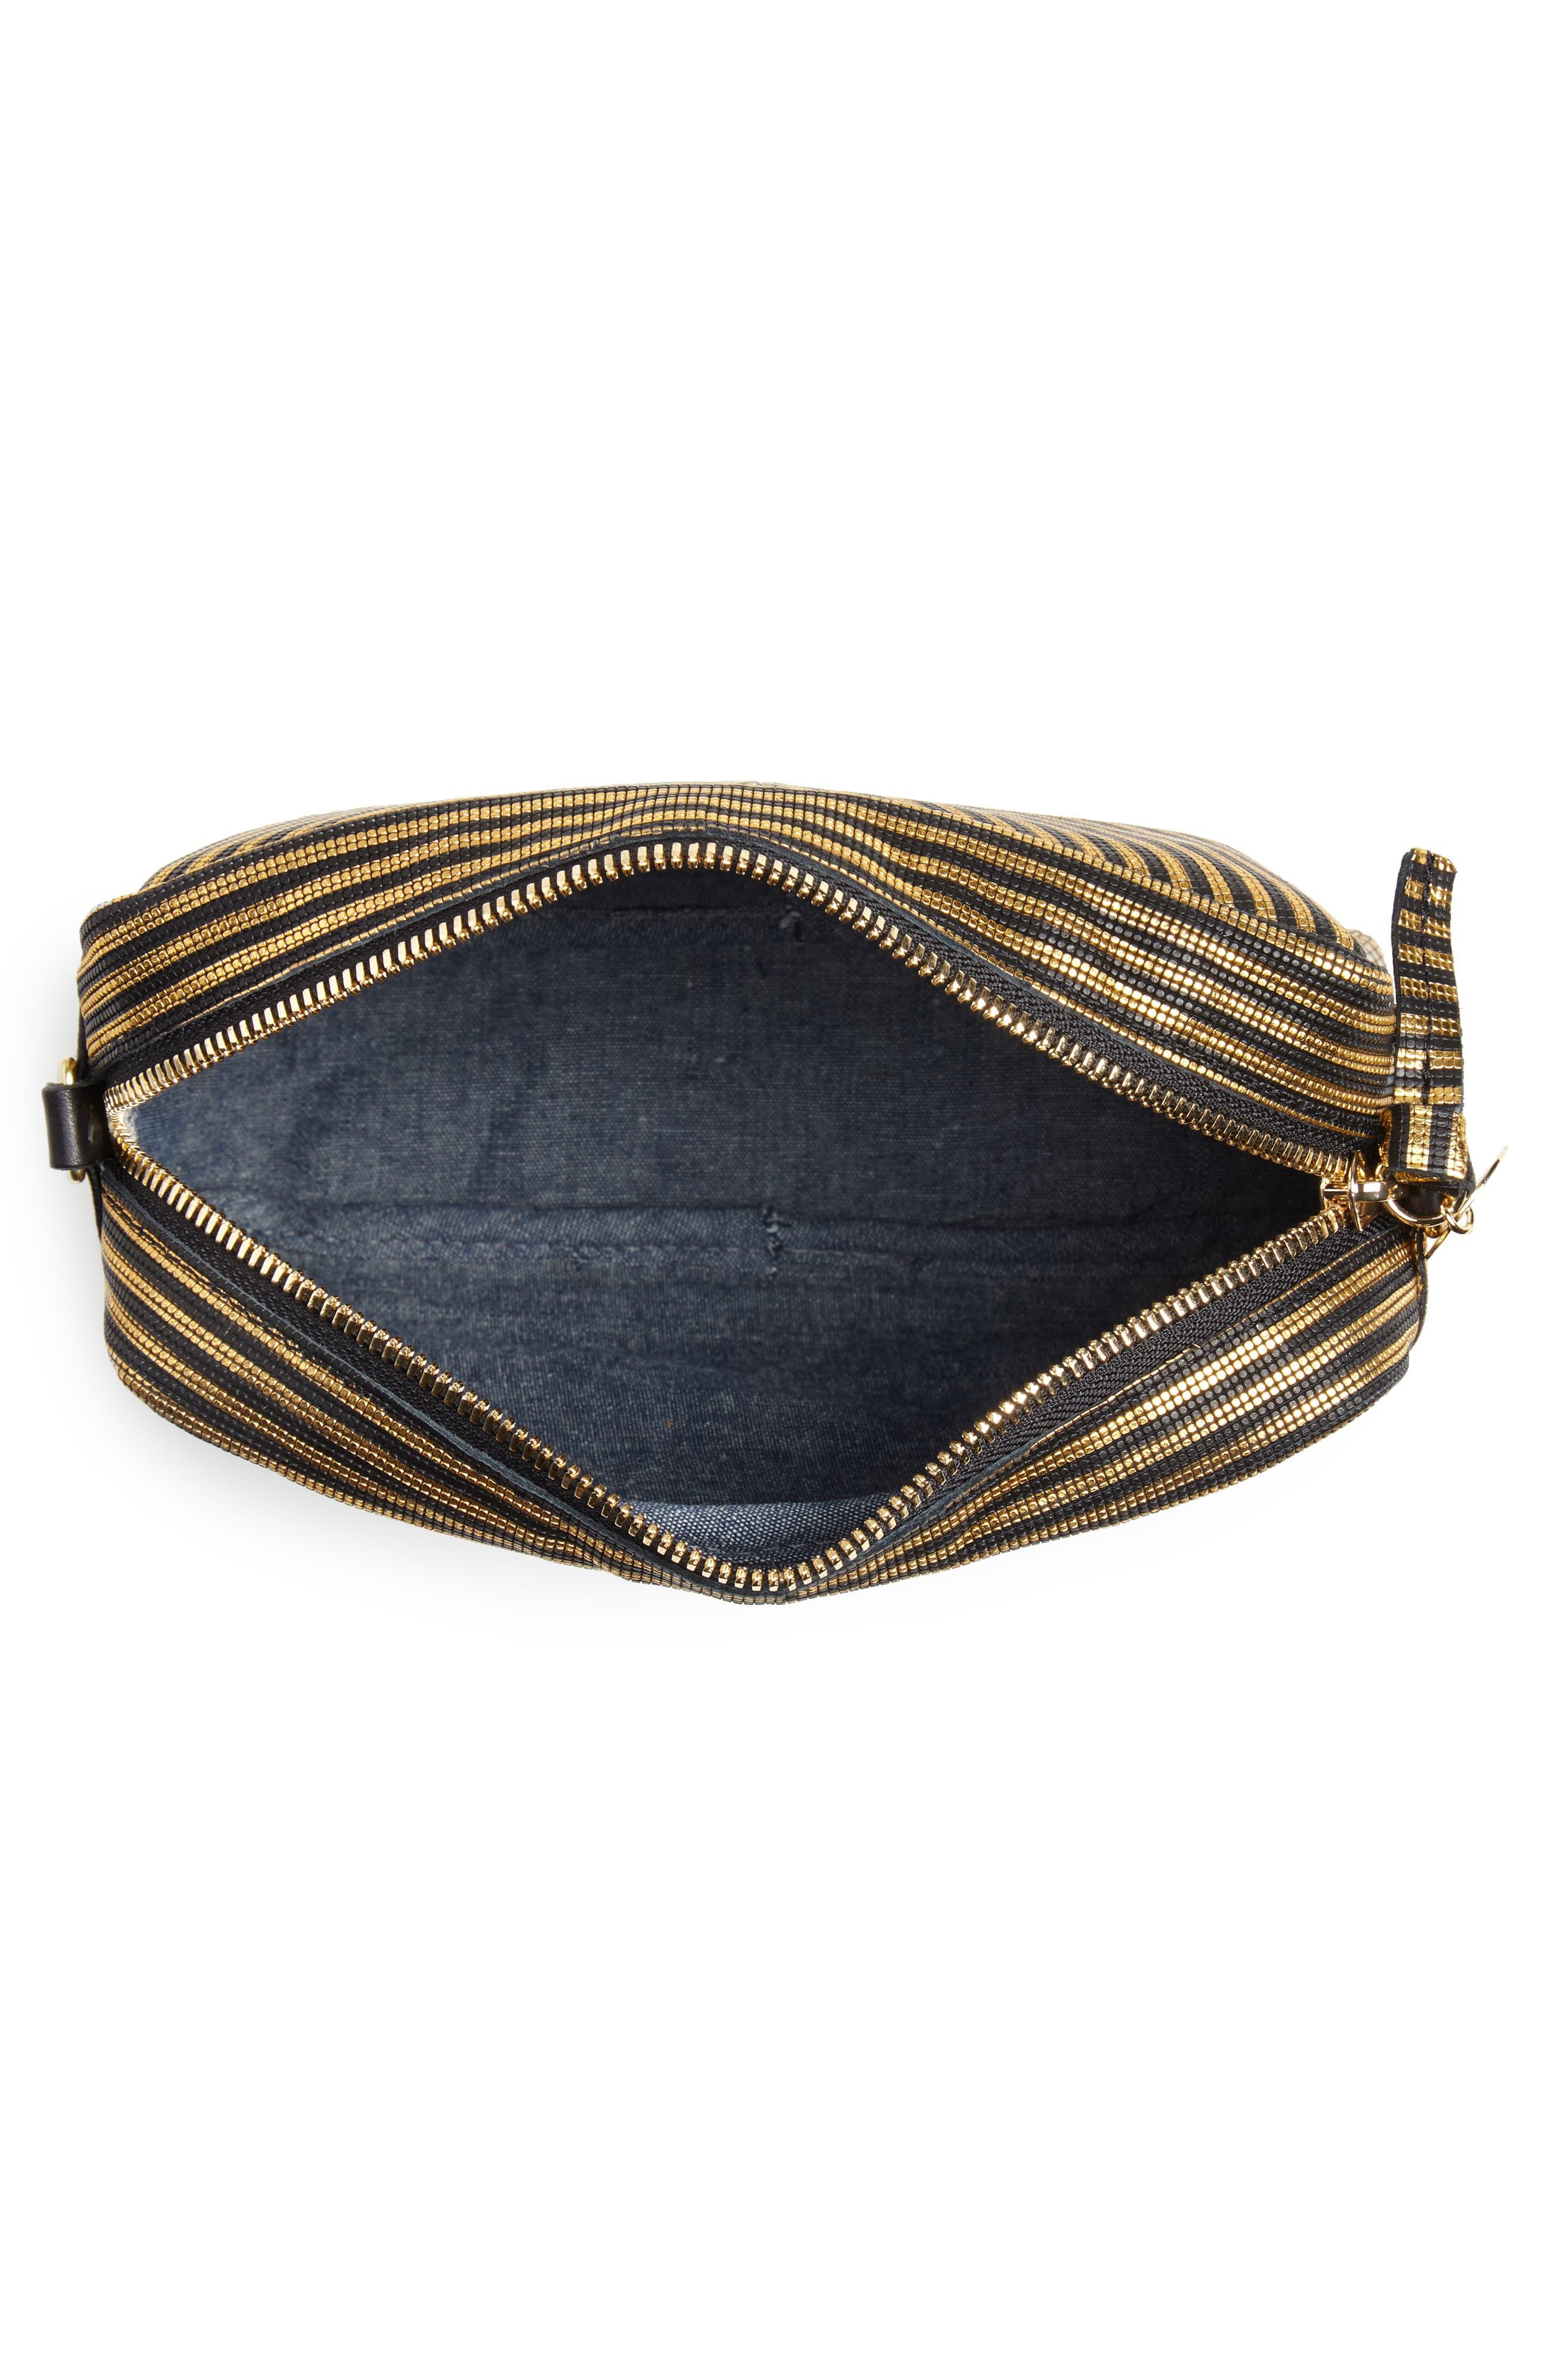 Midi Sac Disco Stripe Leather Crossbody Bag,                             Alternate thumbnail 4, color,                             DISCO STRIPE